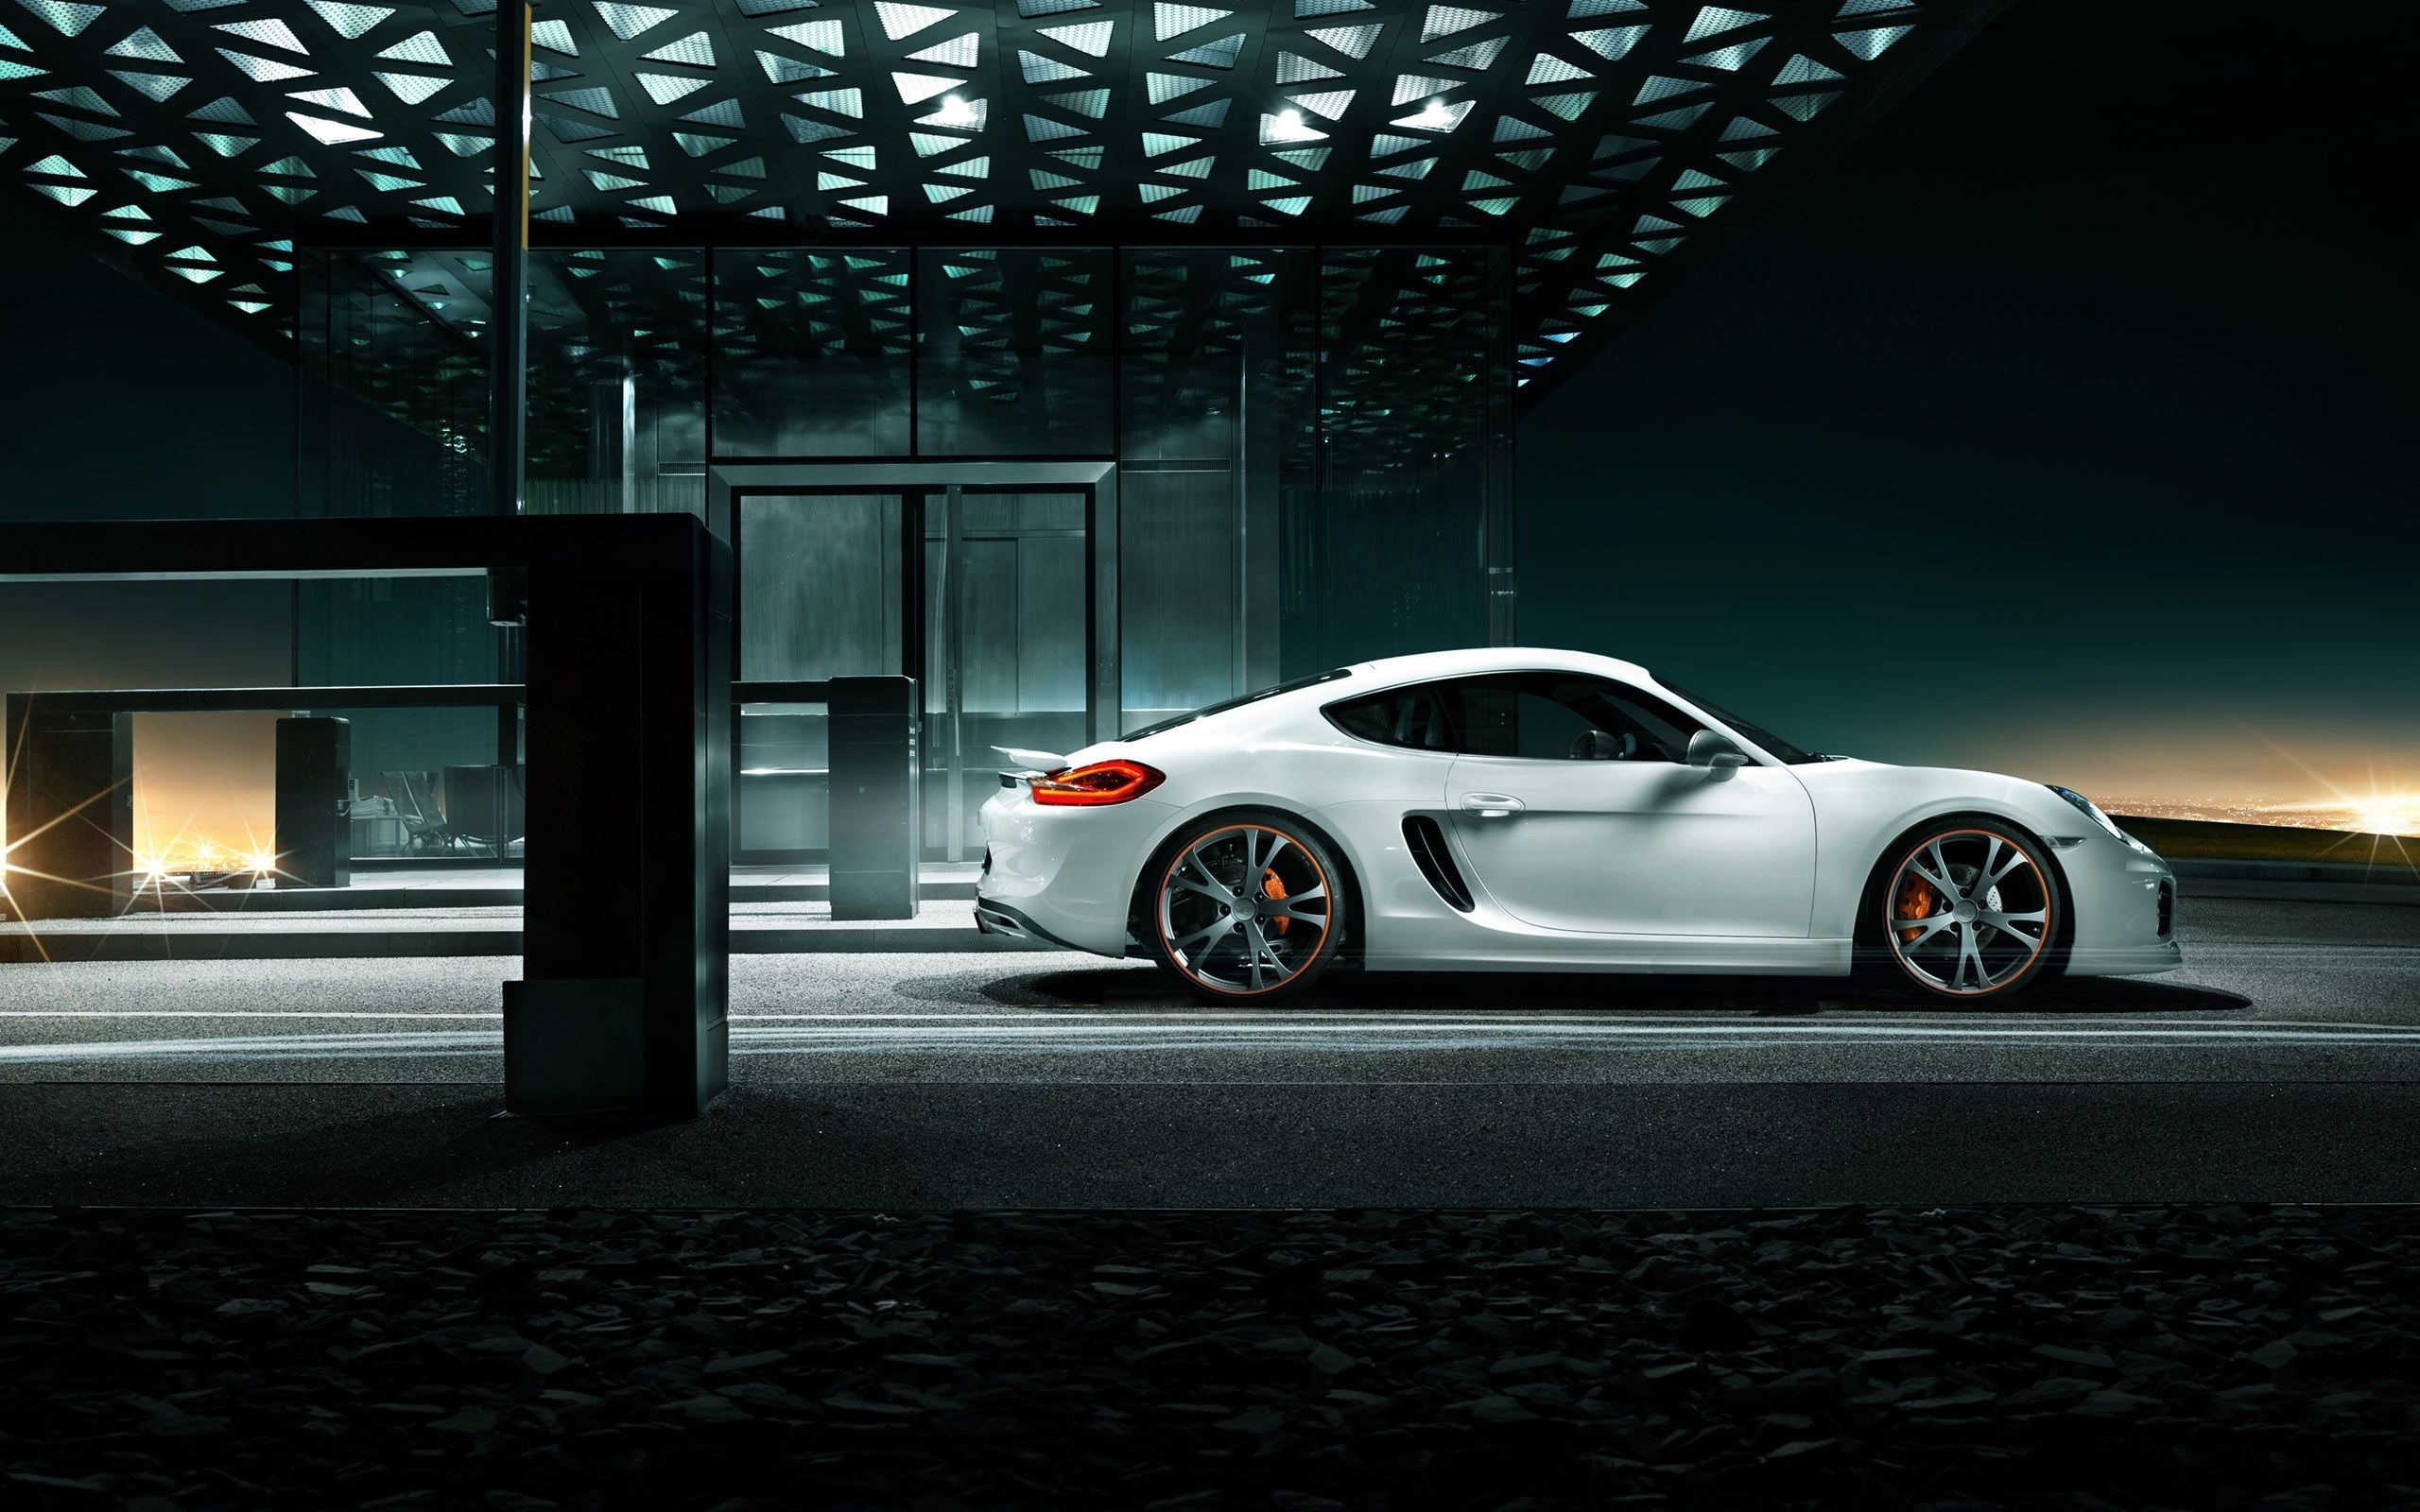 Porsche Phone Wallpapers